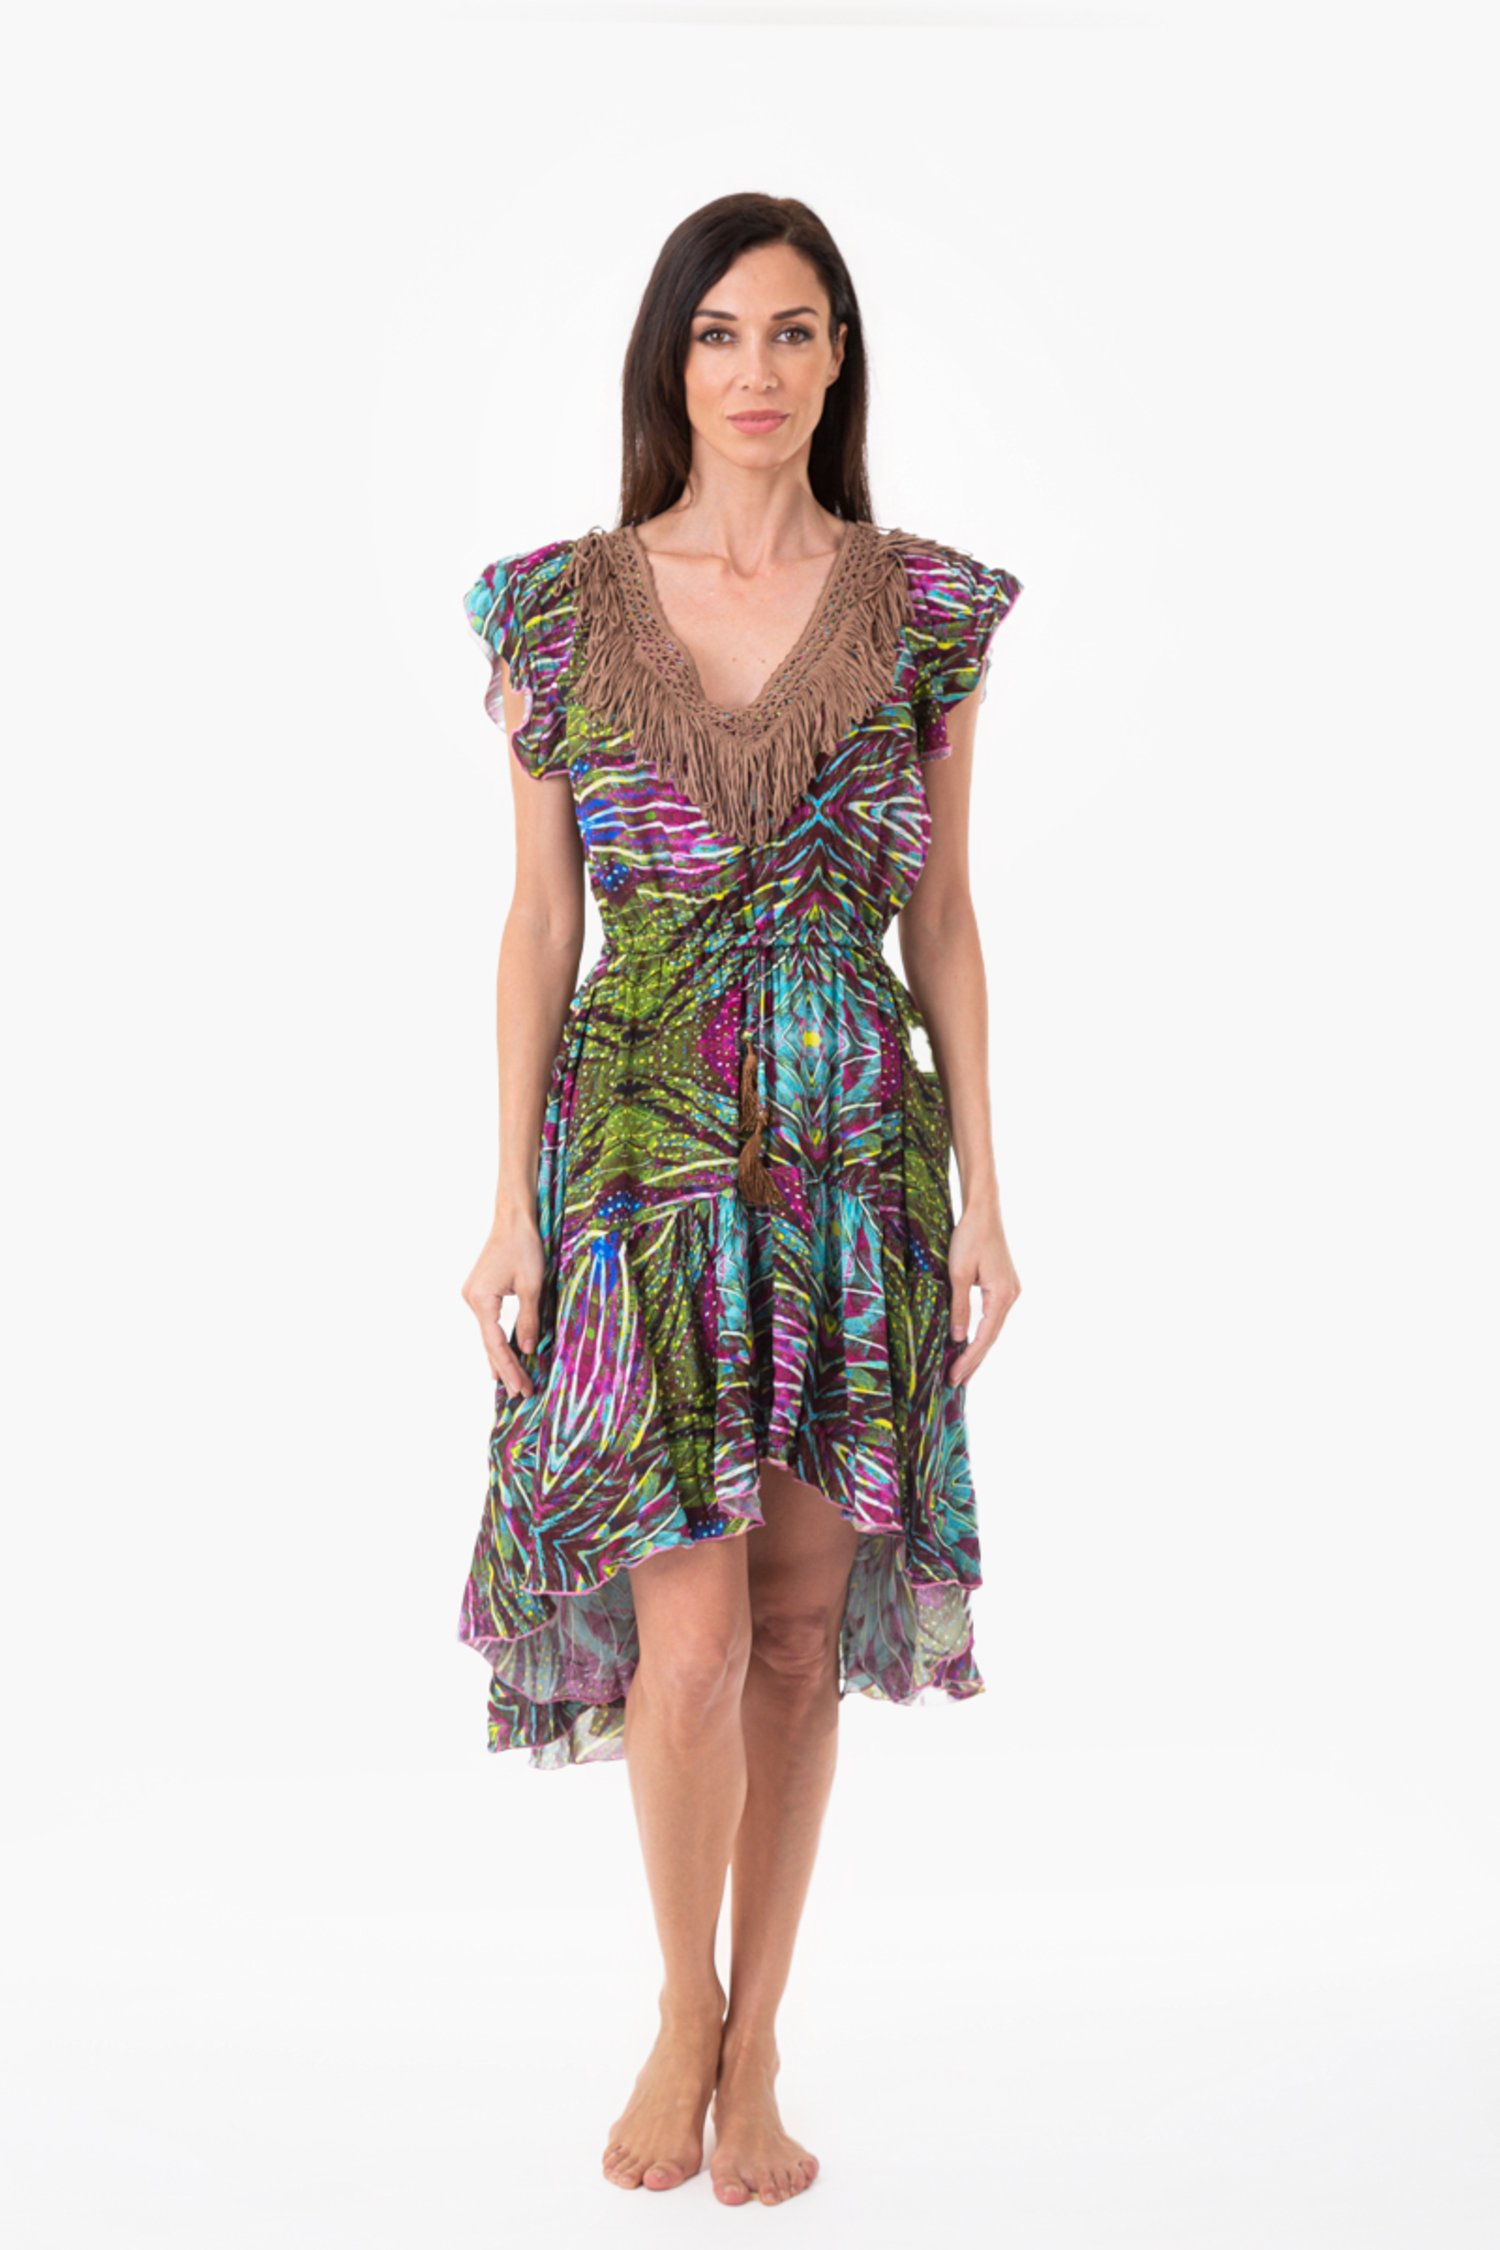 ASYMMETRIC DRESS LONGUETTE WITH TRIMMINGS - Plumage Azzurro